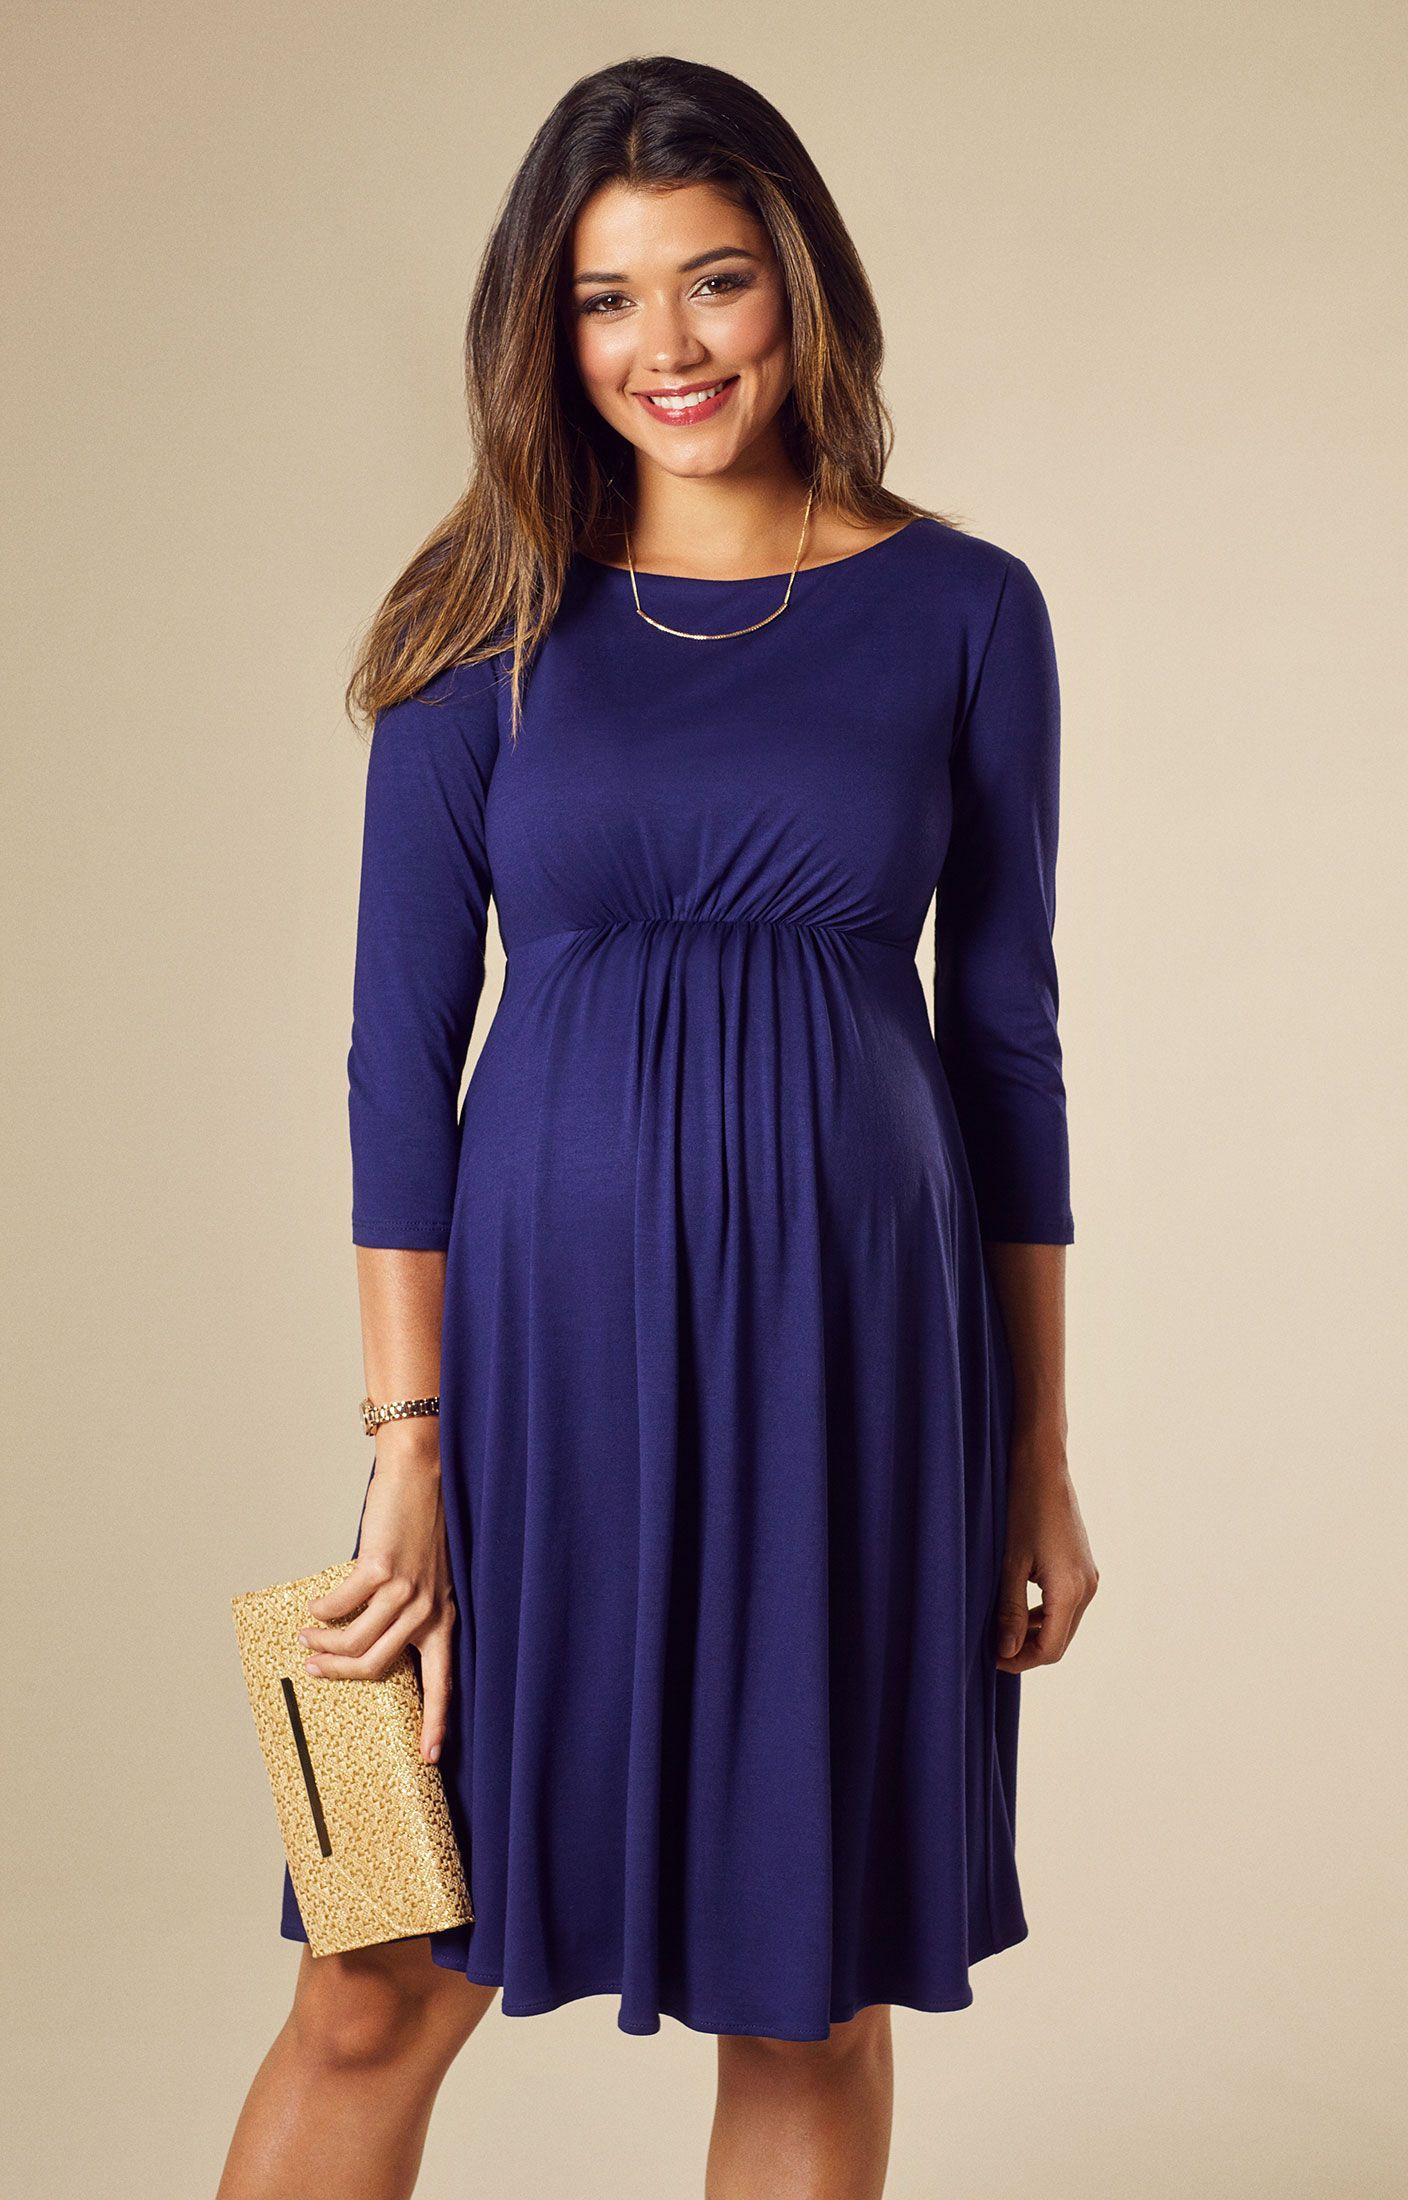 Royal blue lace dress styles  Cathy Dress  Tiffany rose Maternity dresses and Tiffany